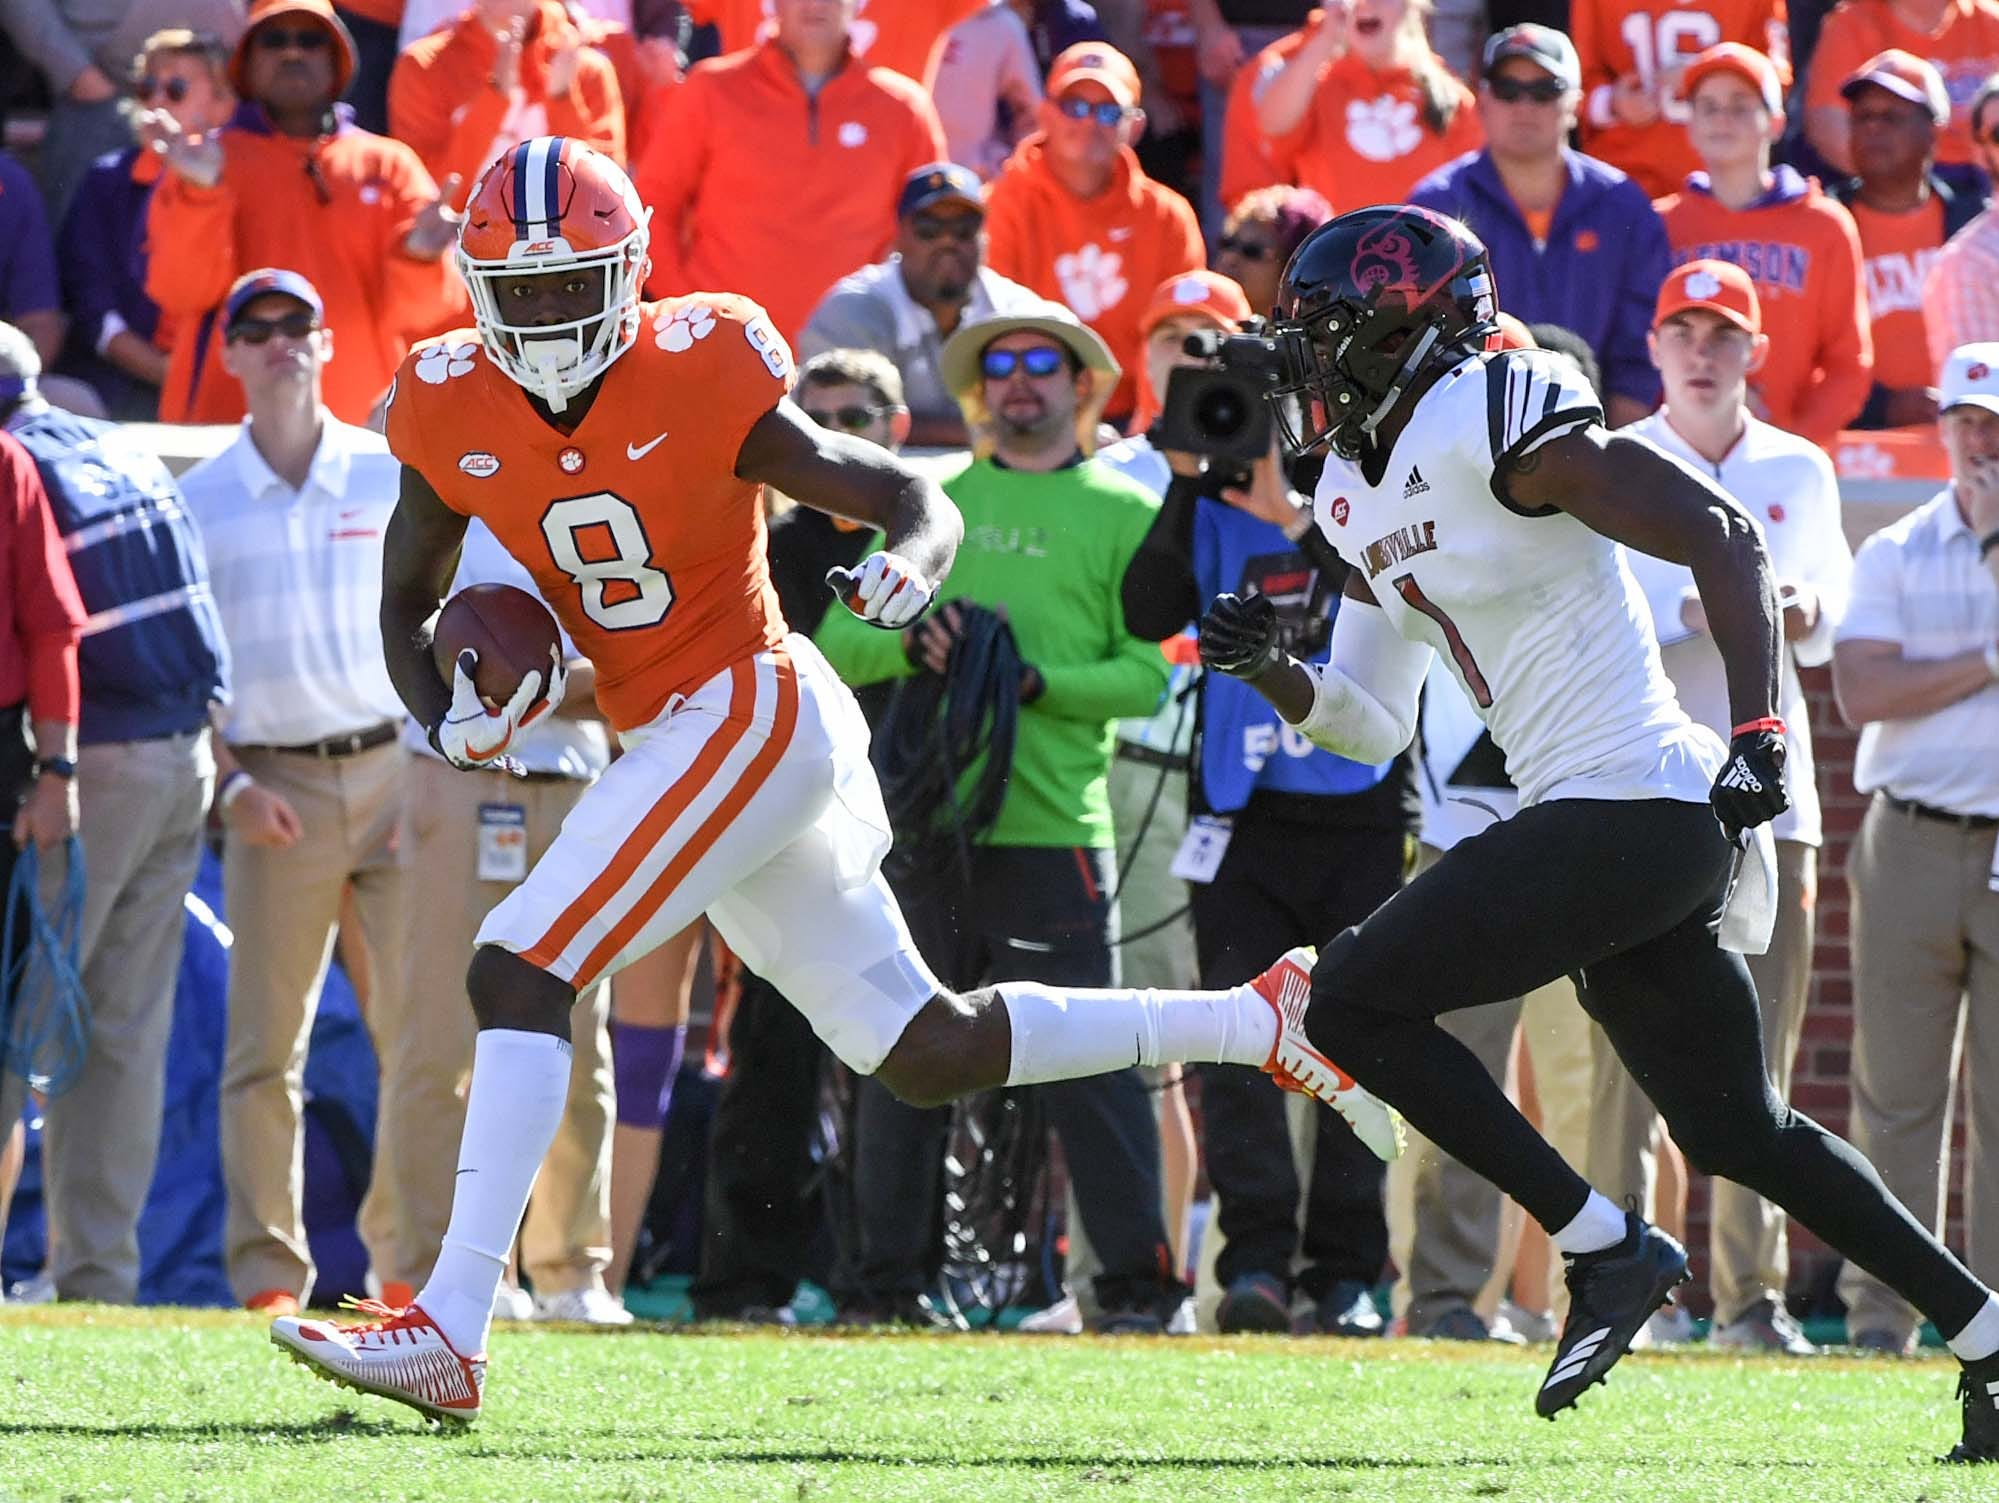 Clemson wide receiver Justyn Ross (8) runs by Louisville cornerback P.J. Mbanasor(1) for a 59-yard touchdown during the third quarter in Memorial Stadium on Saturday, November 3, 2018.